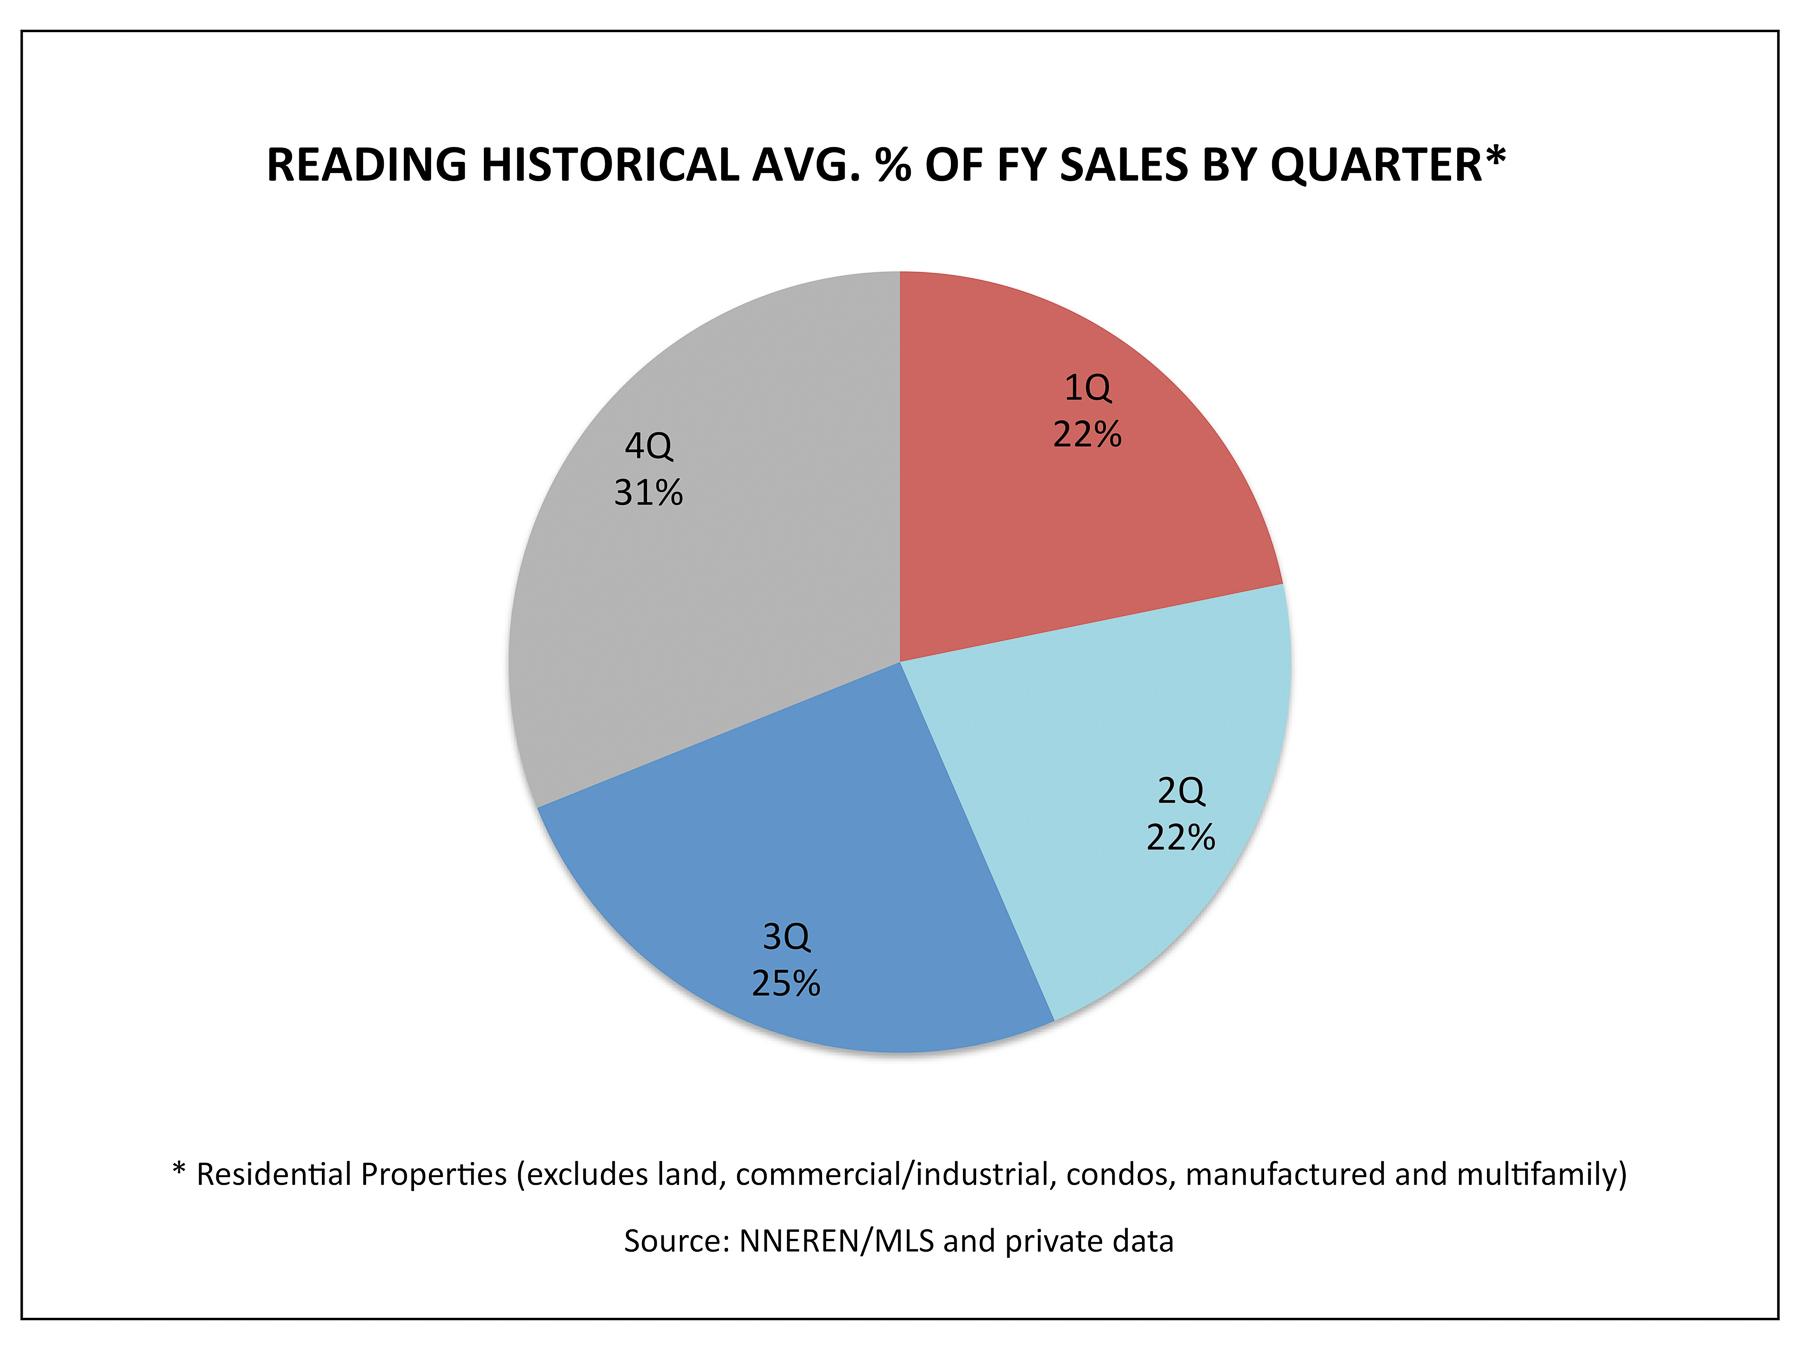 Reading VT Real Estate - 1Q Historical Avg. % Homes Sold Per Quarter